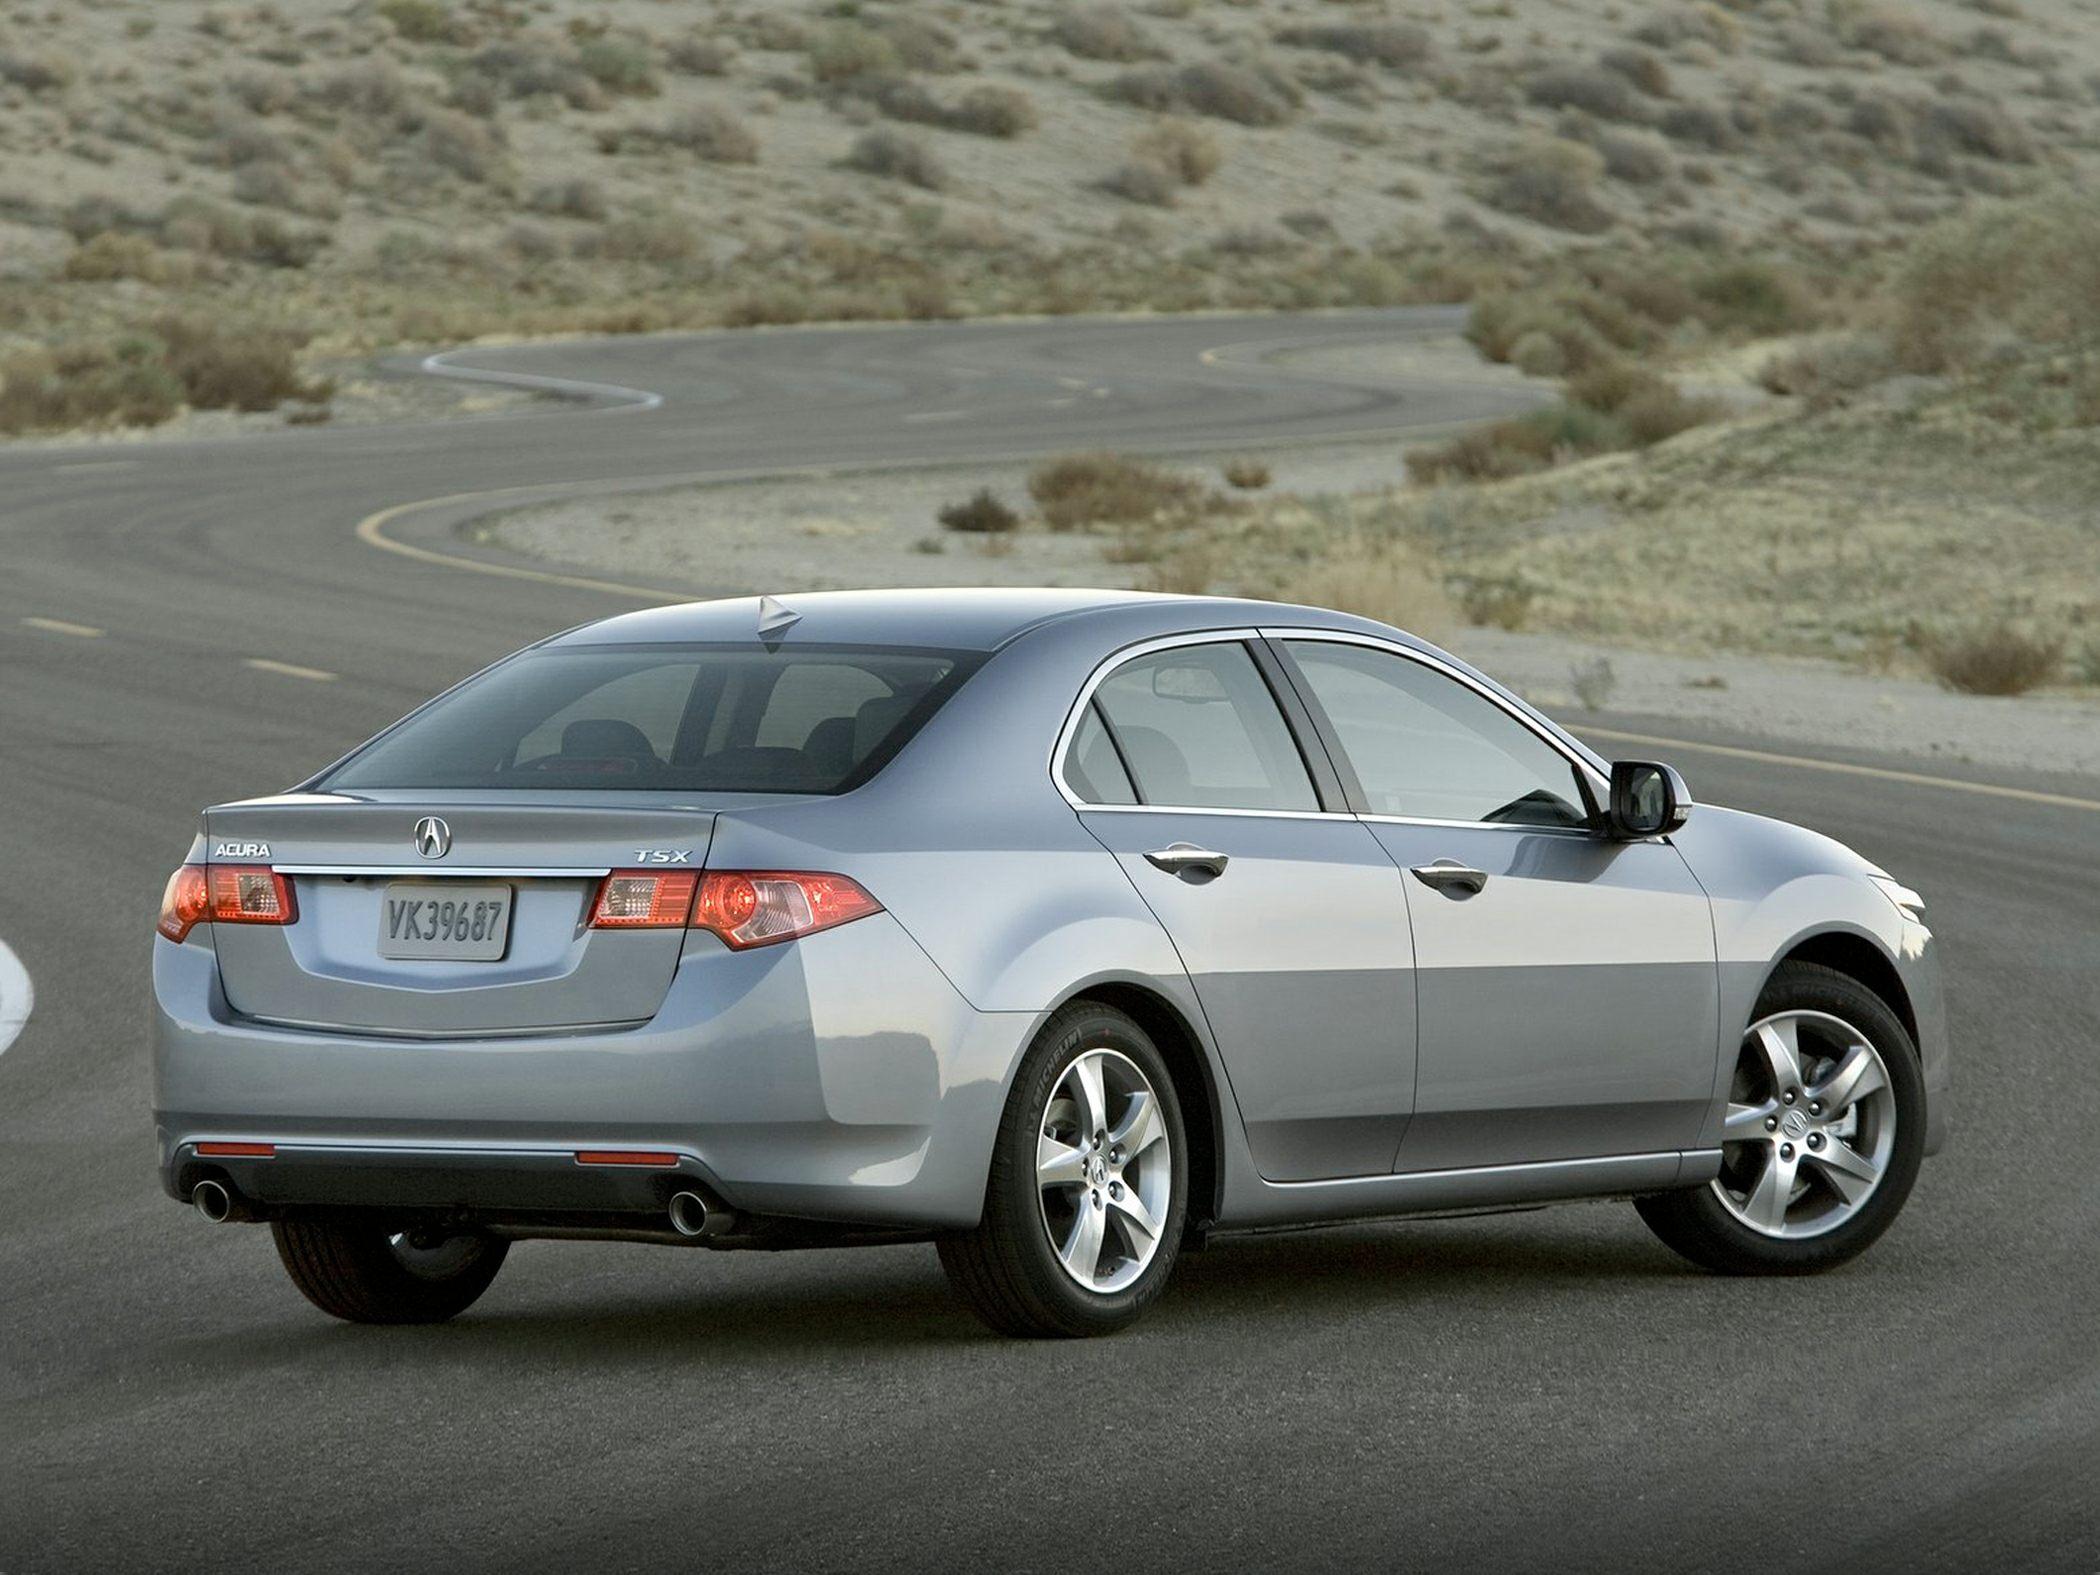 2014 Acura TSX Glam